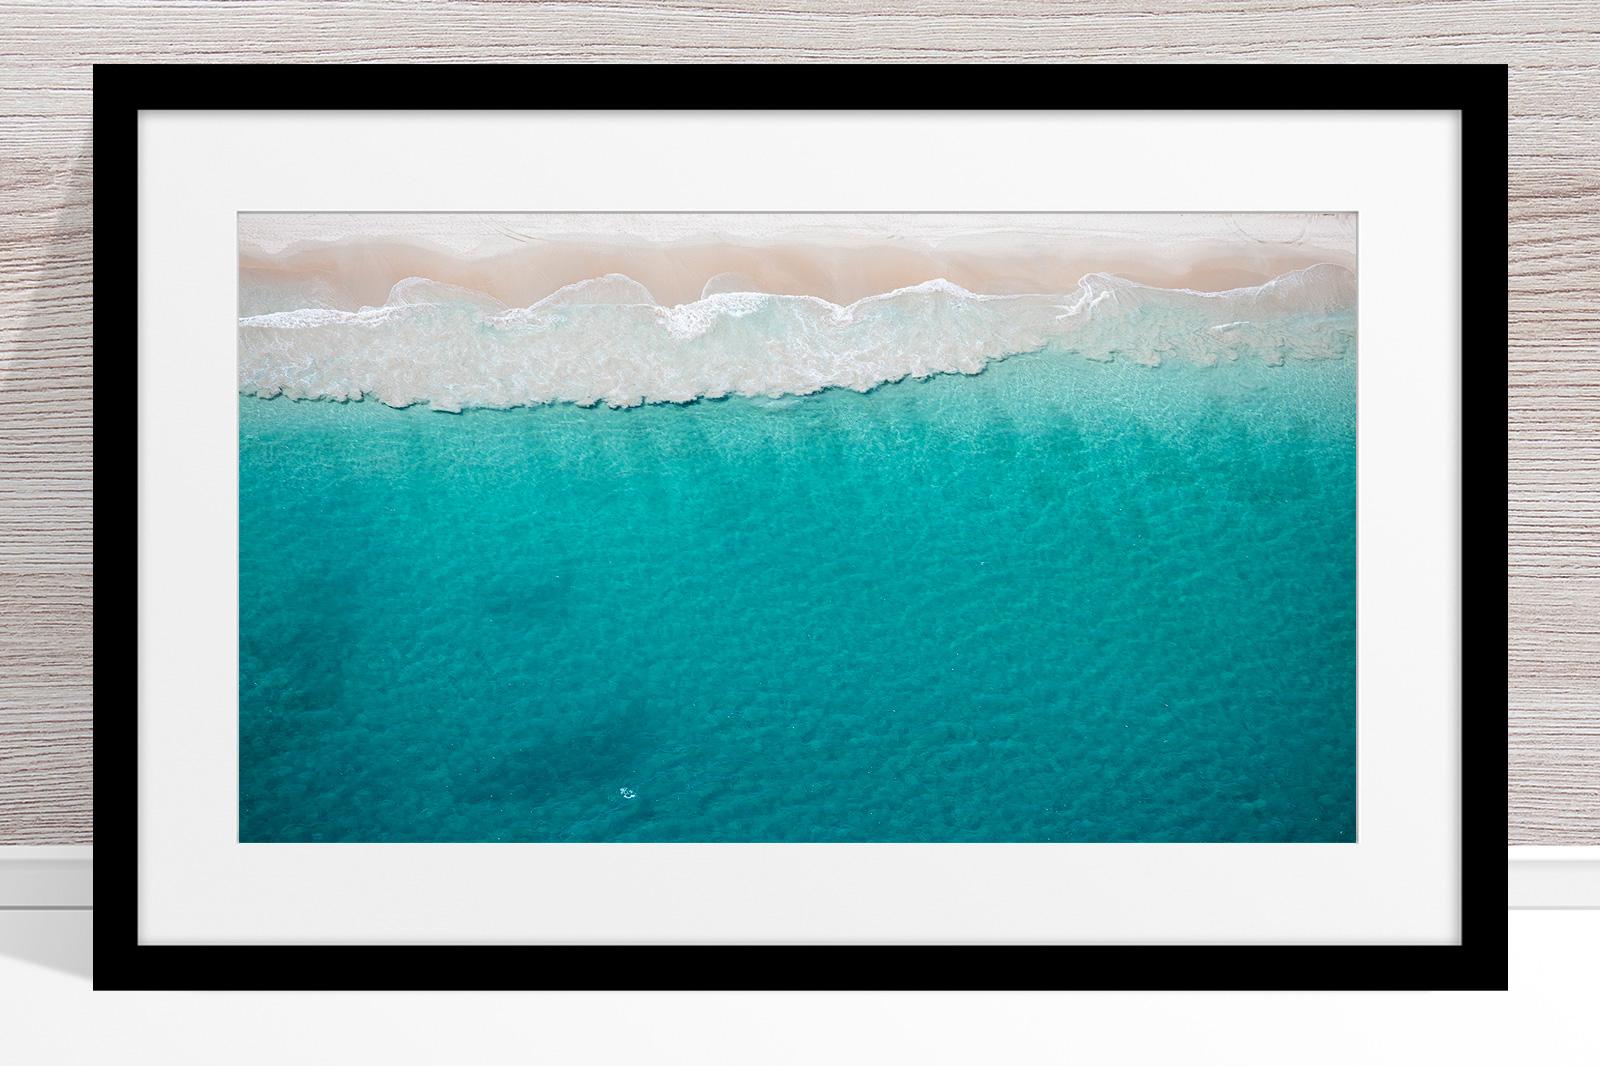 034 - Jason Mazur - 'North Beach Aerial' Black Frame